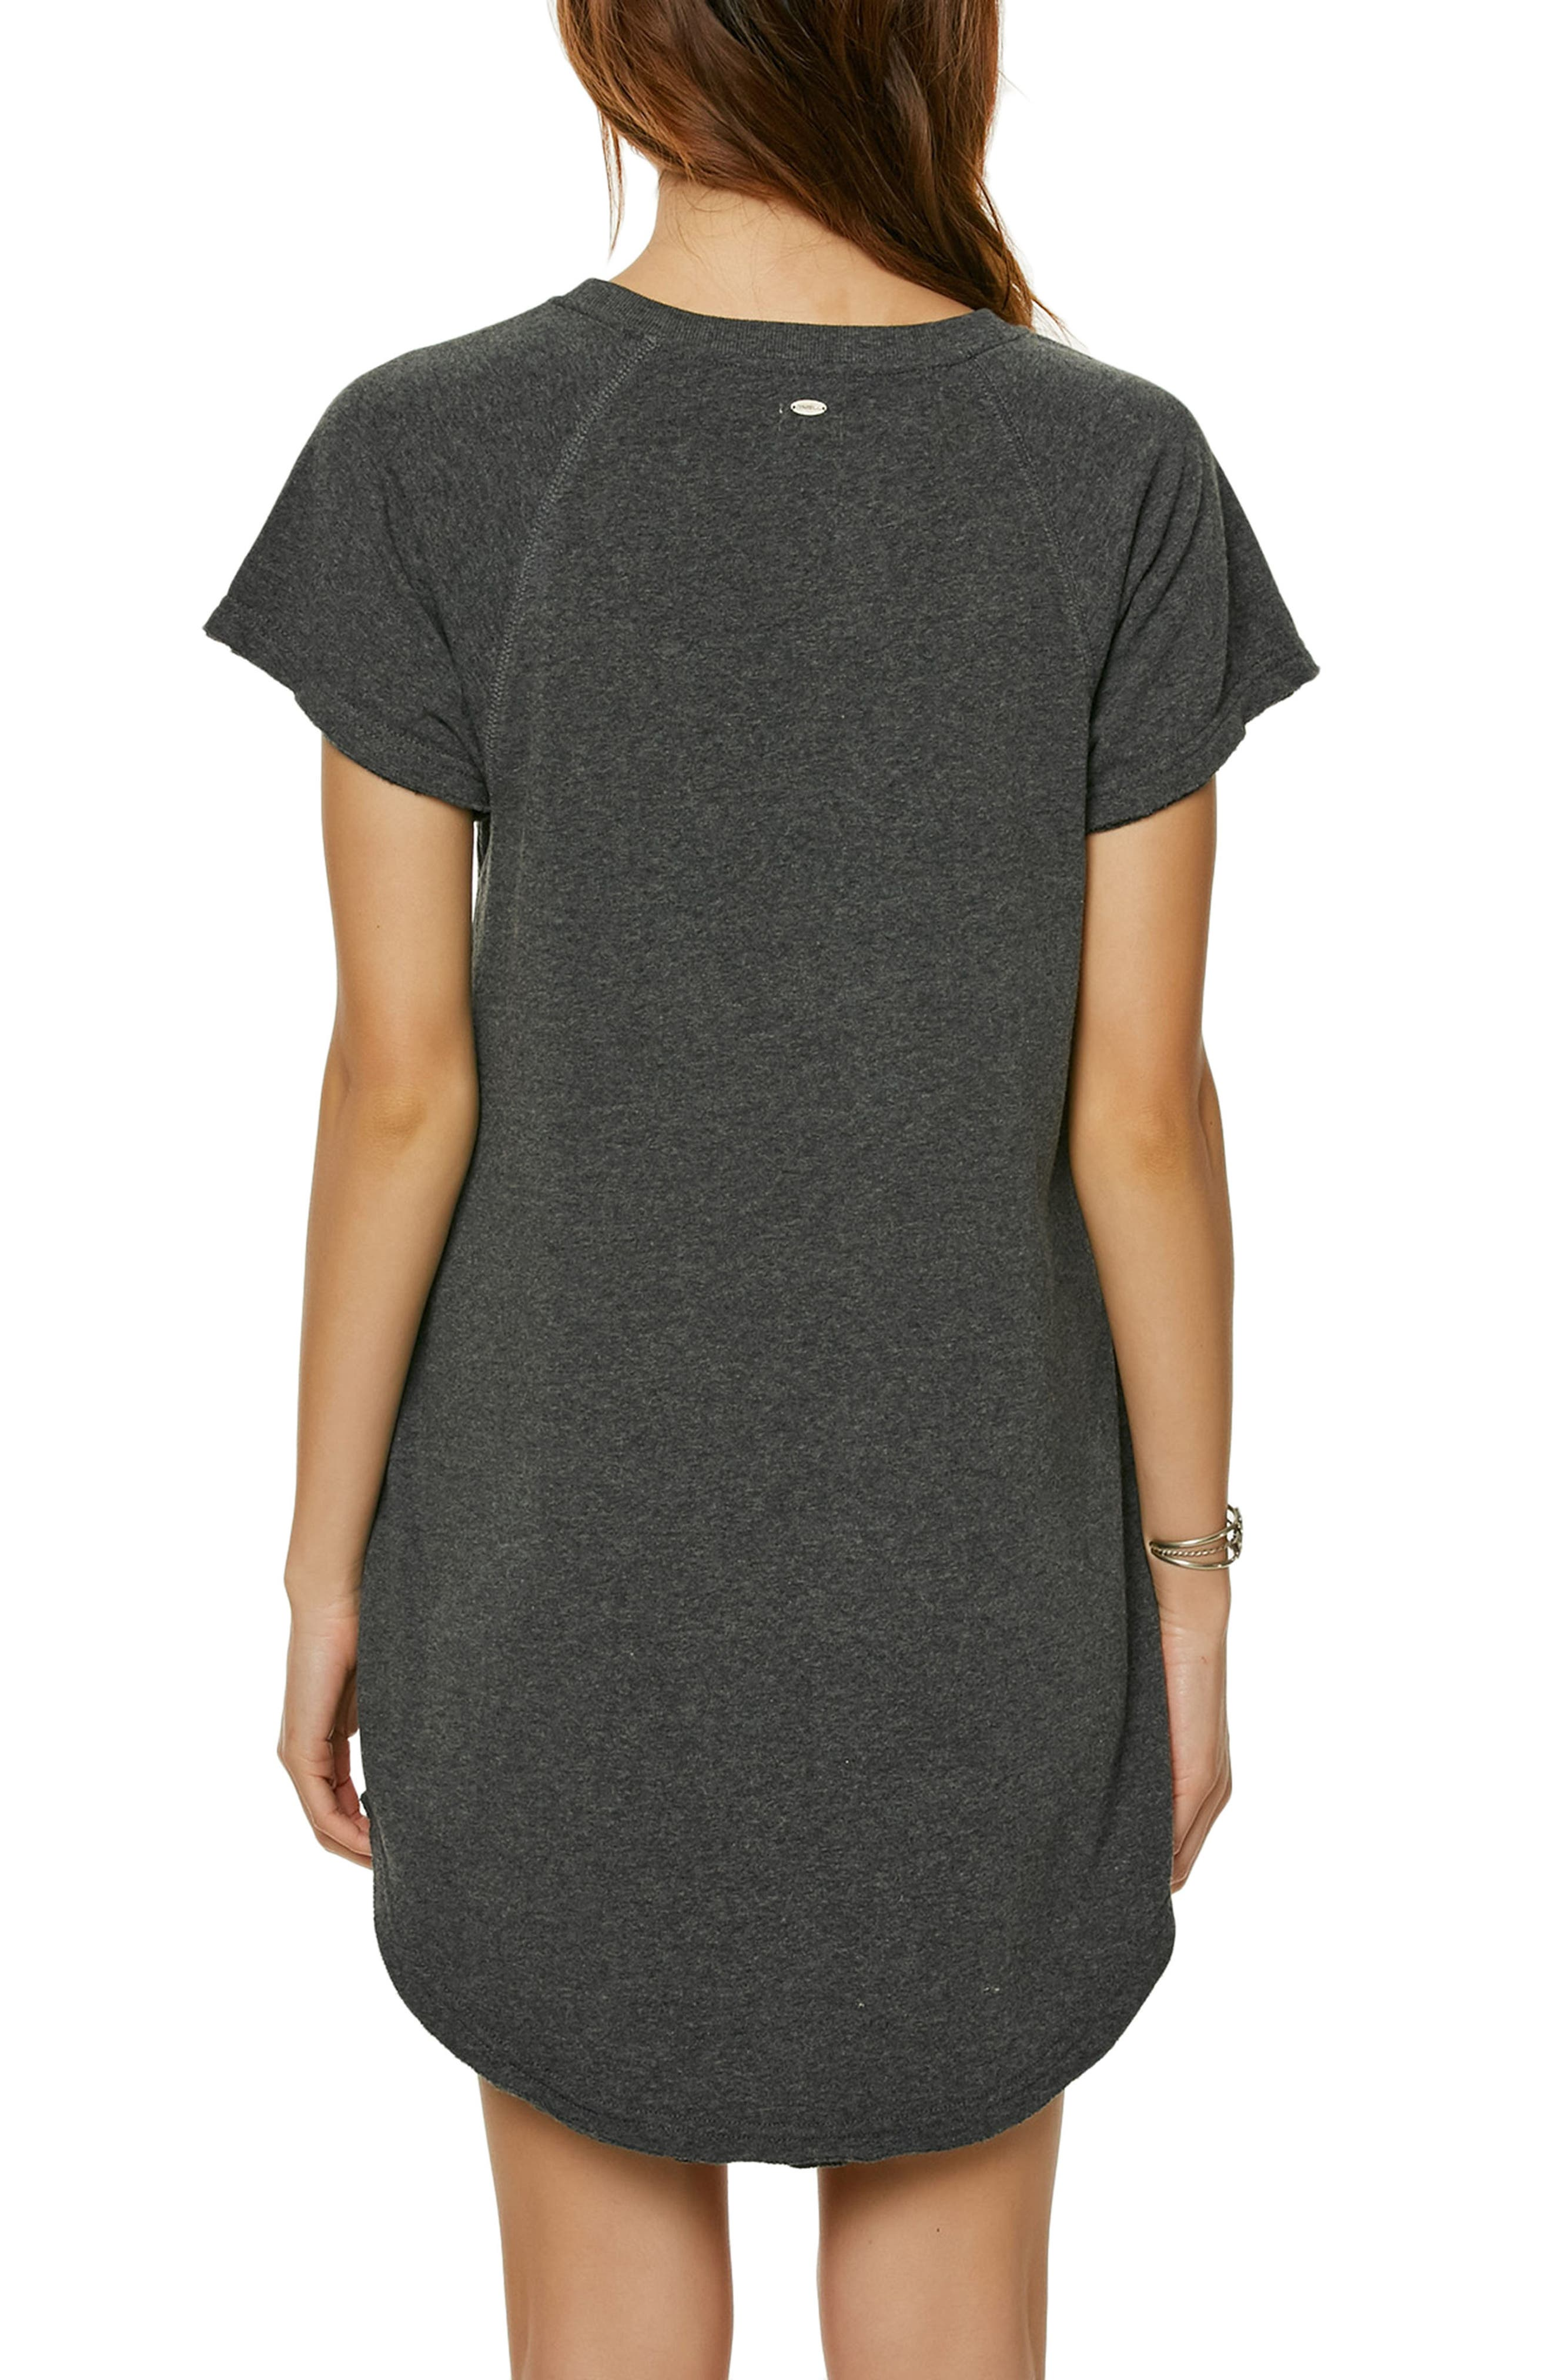 Morganne T-Shirt Dress,                             Alternate thumbnail 2, color,                             Heather Black